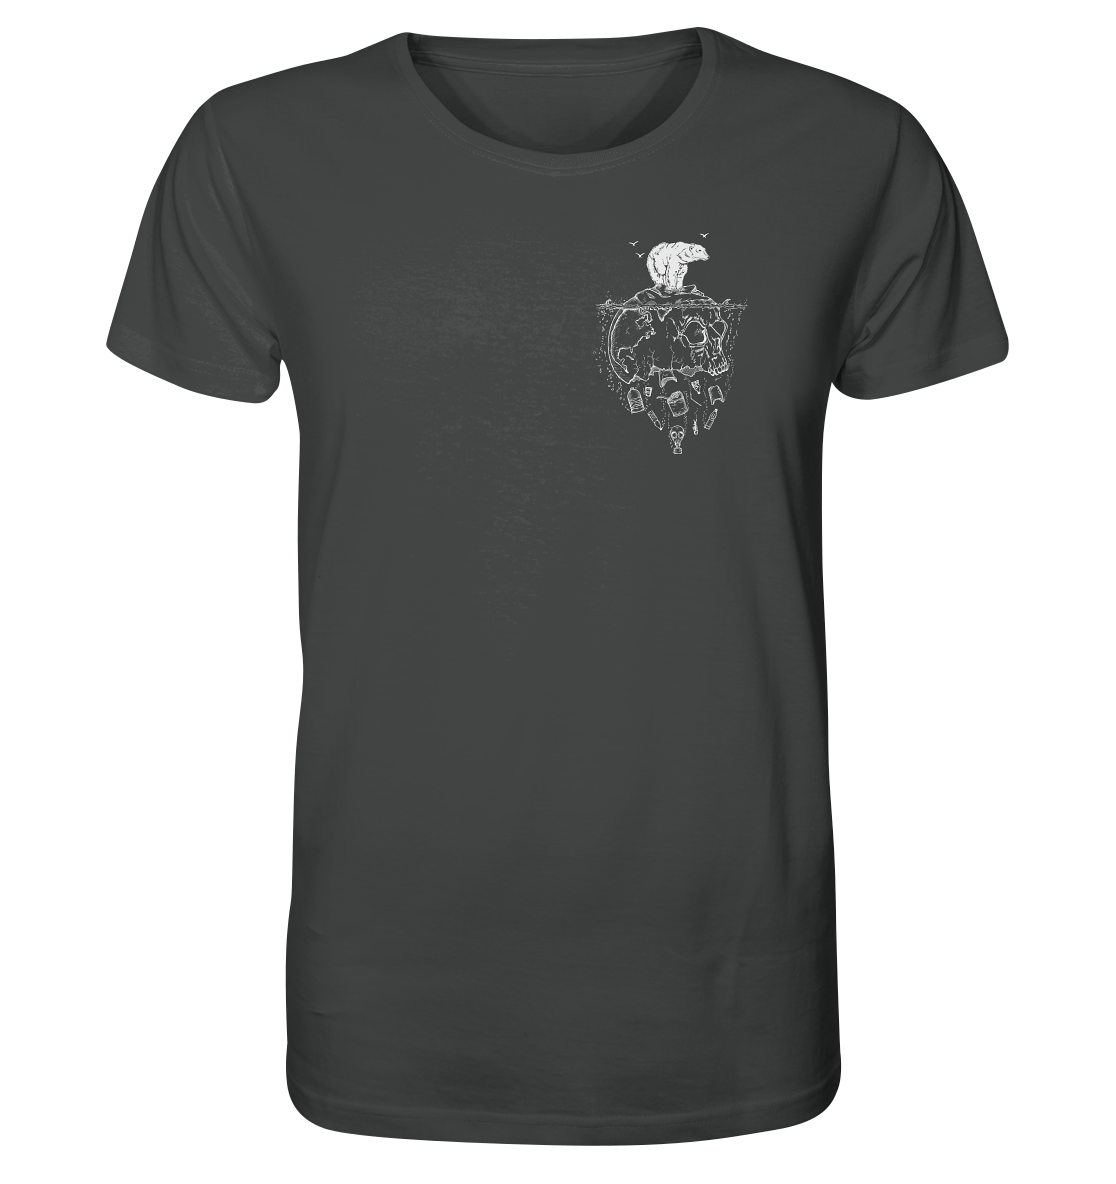 front-organic-shirt-444545-1116x-16.png